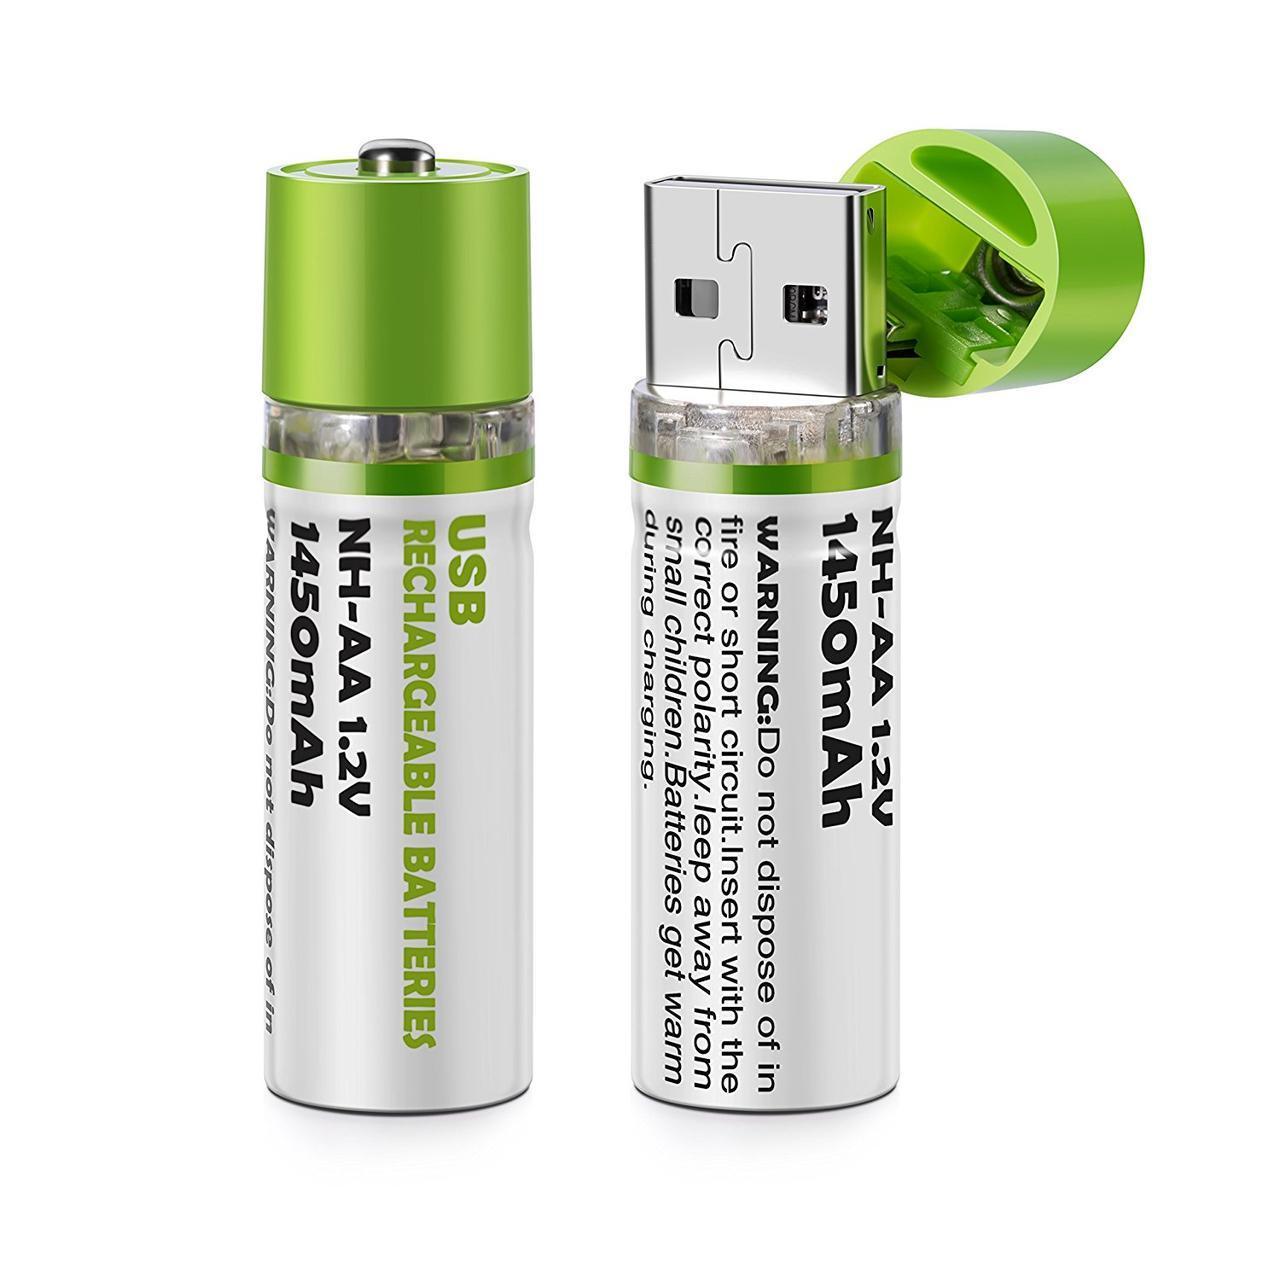 USB аккумуляторы AA 1.2V 1450mAh Ni-MH